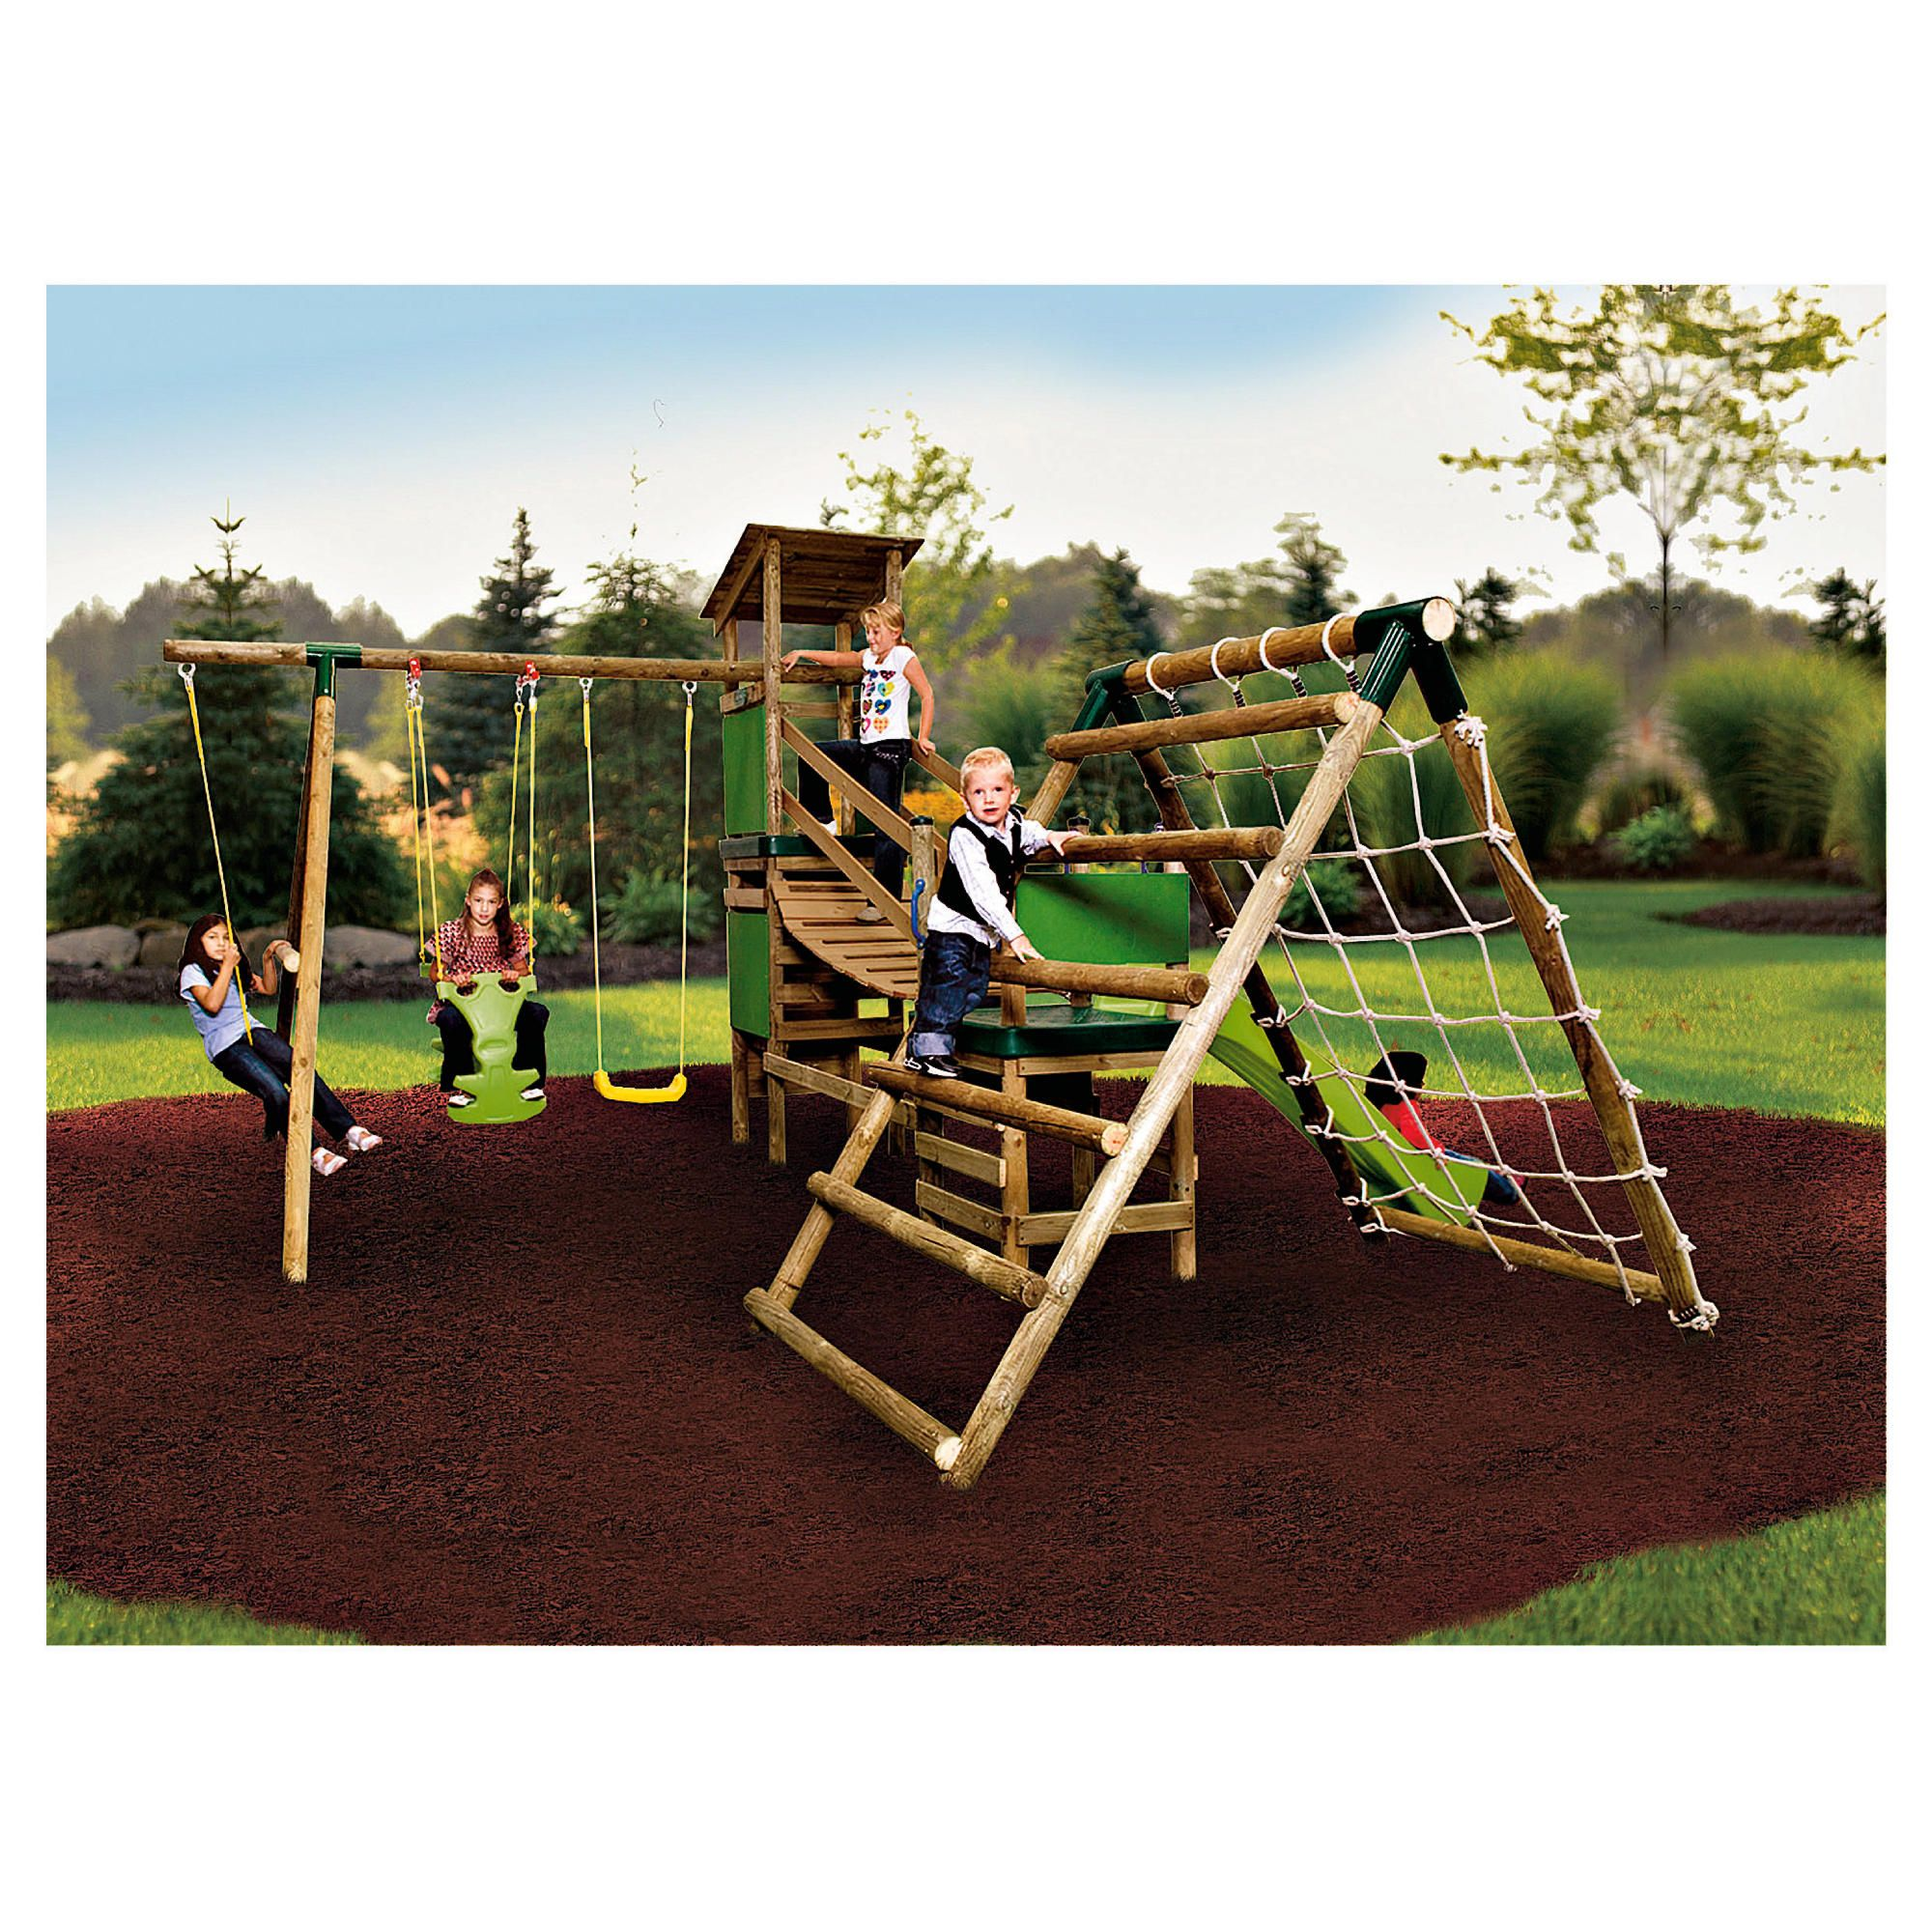 Little Tikes Marlow Bridge Climb 'n' Slide Wooden Swing Set at Tesco Direct